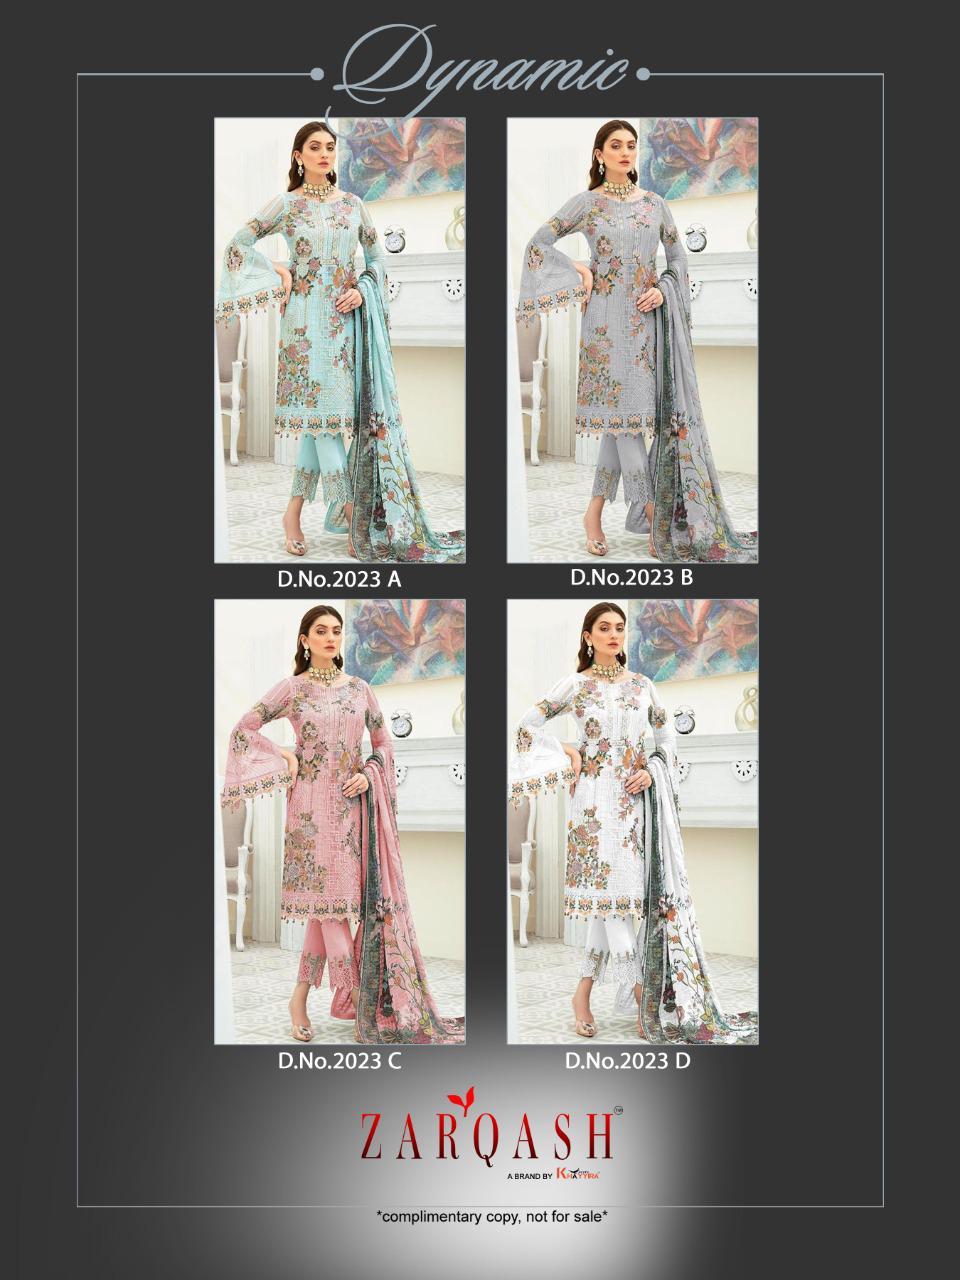 Zarqash Dynamic by Khayyira Salwar Suit Wholesale Catalog 4 Pcs 6 - Zarqash Dynamic by Khayyira Salwar Suit Wholesale Catalog 4 Pcs